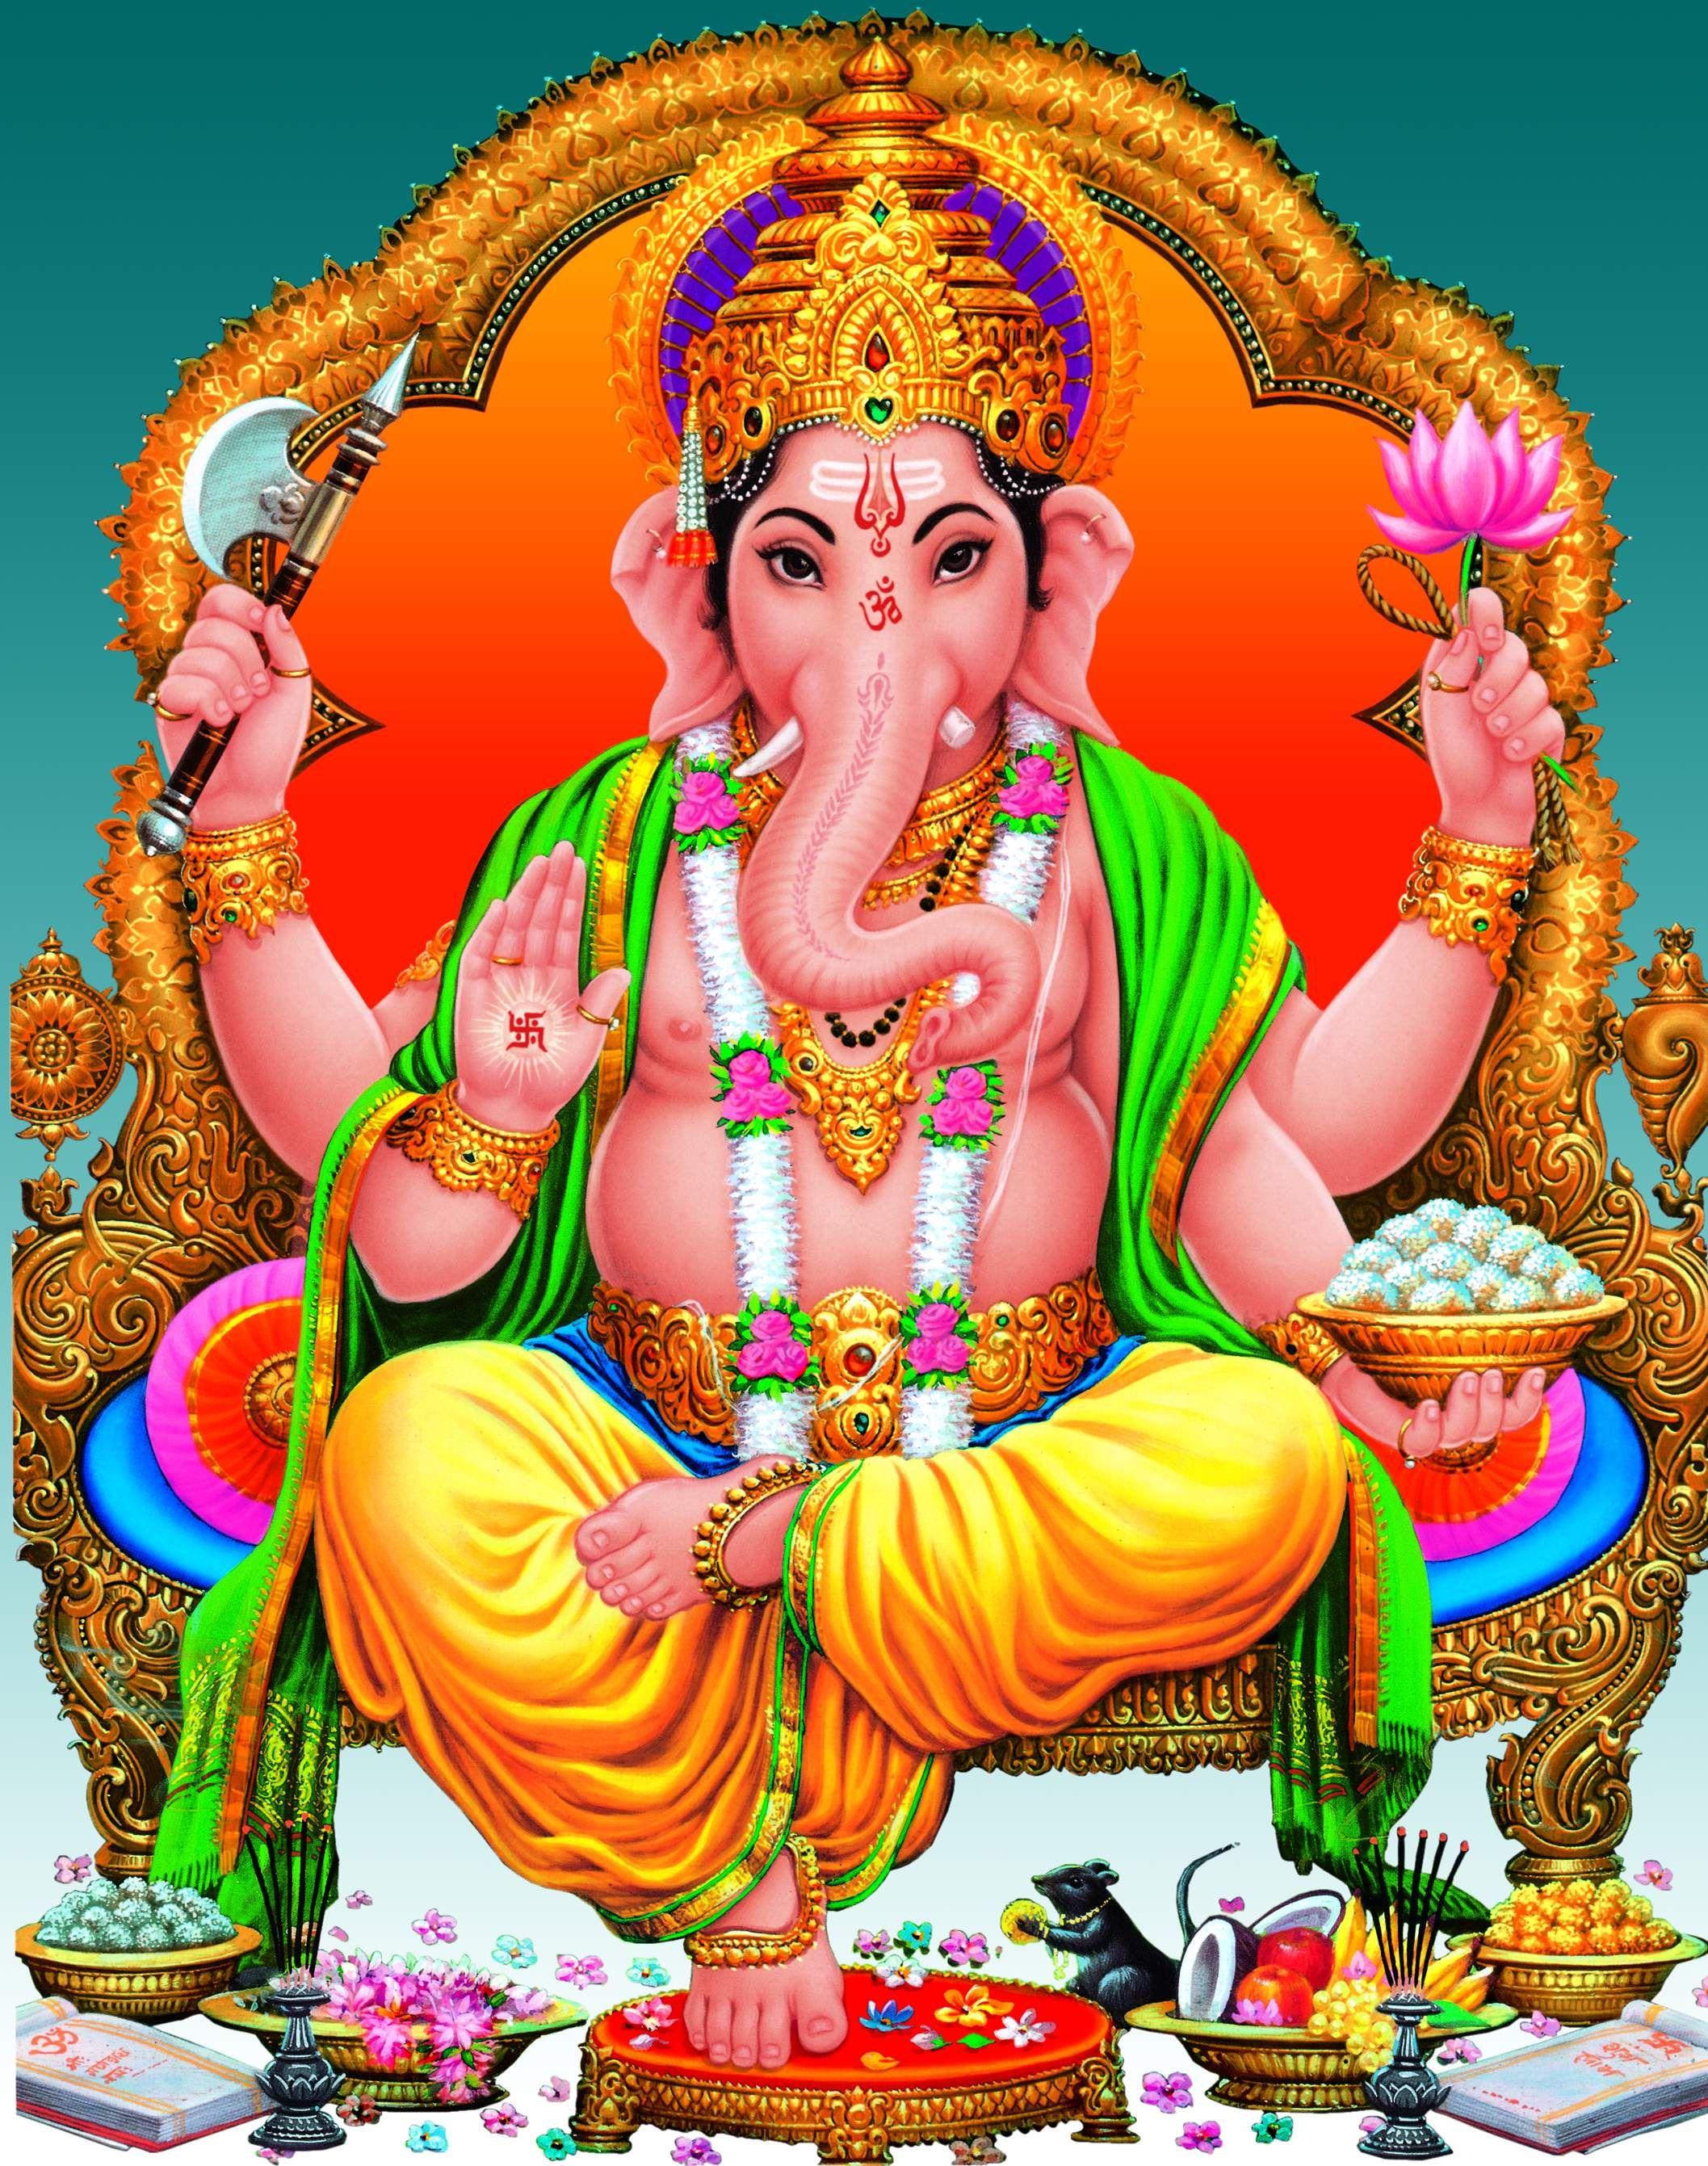 Hd wallpaper ganesh ji - Lord Ganesh Indian God Ganesha Ji Full Hd